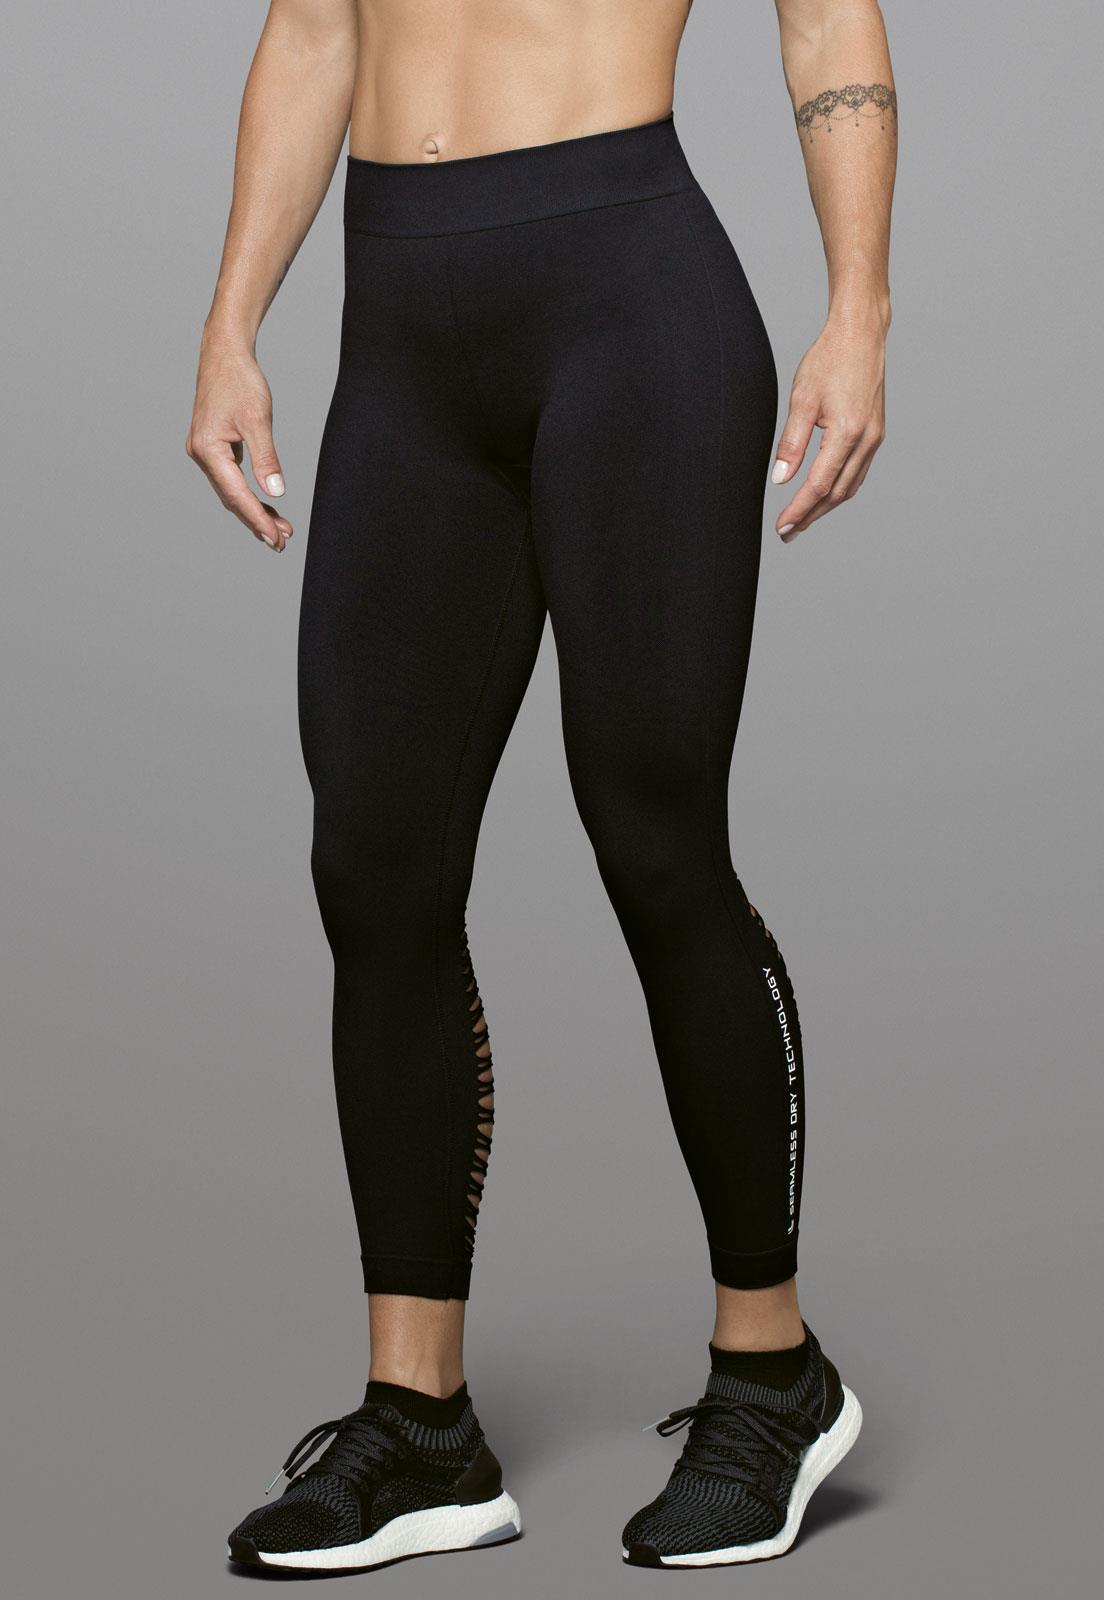 56999d13c Calça Legging Lace Lupo Fitness 71710-001